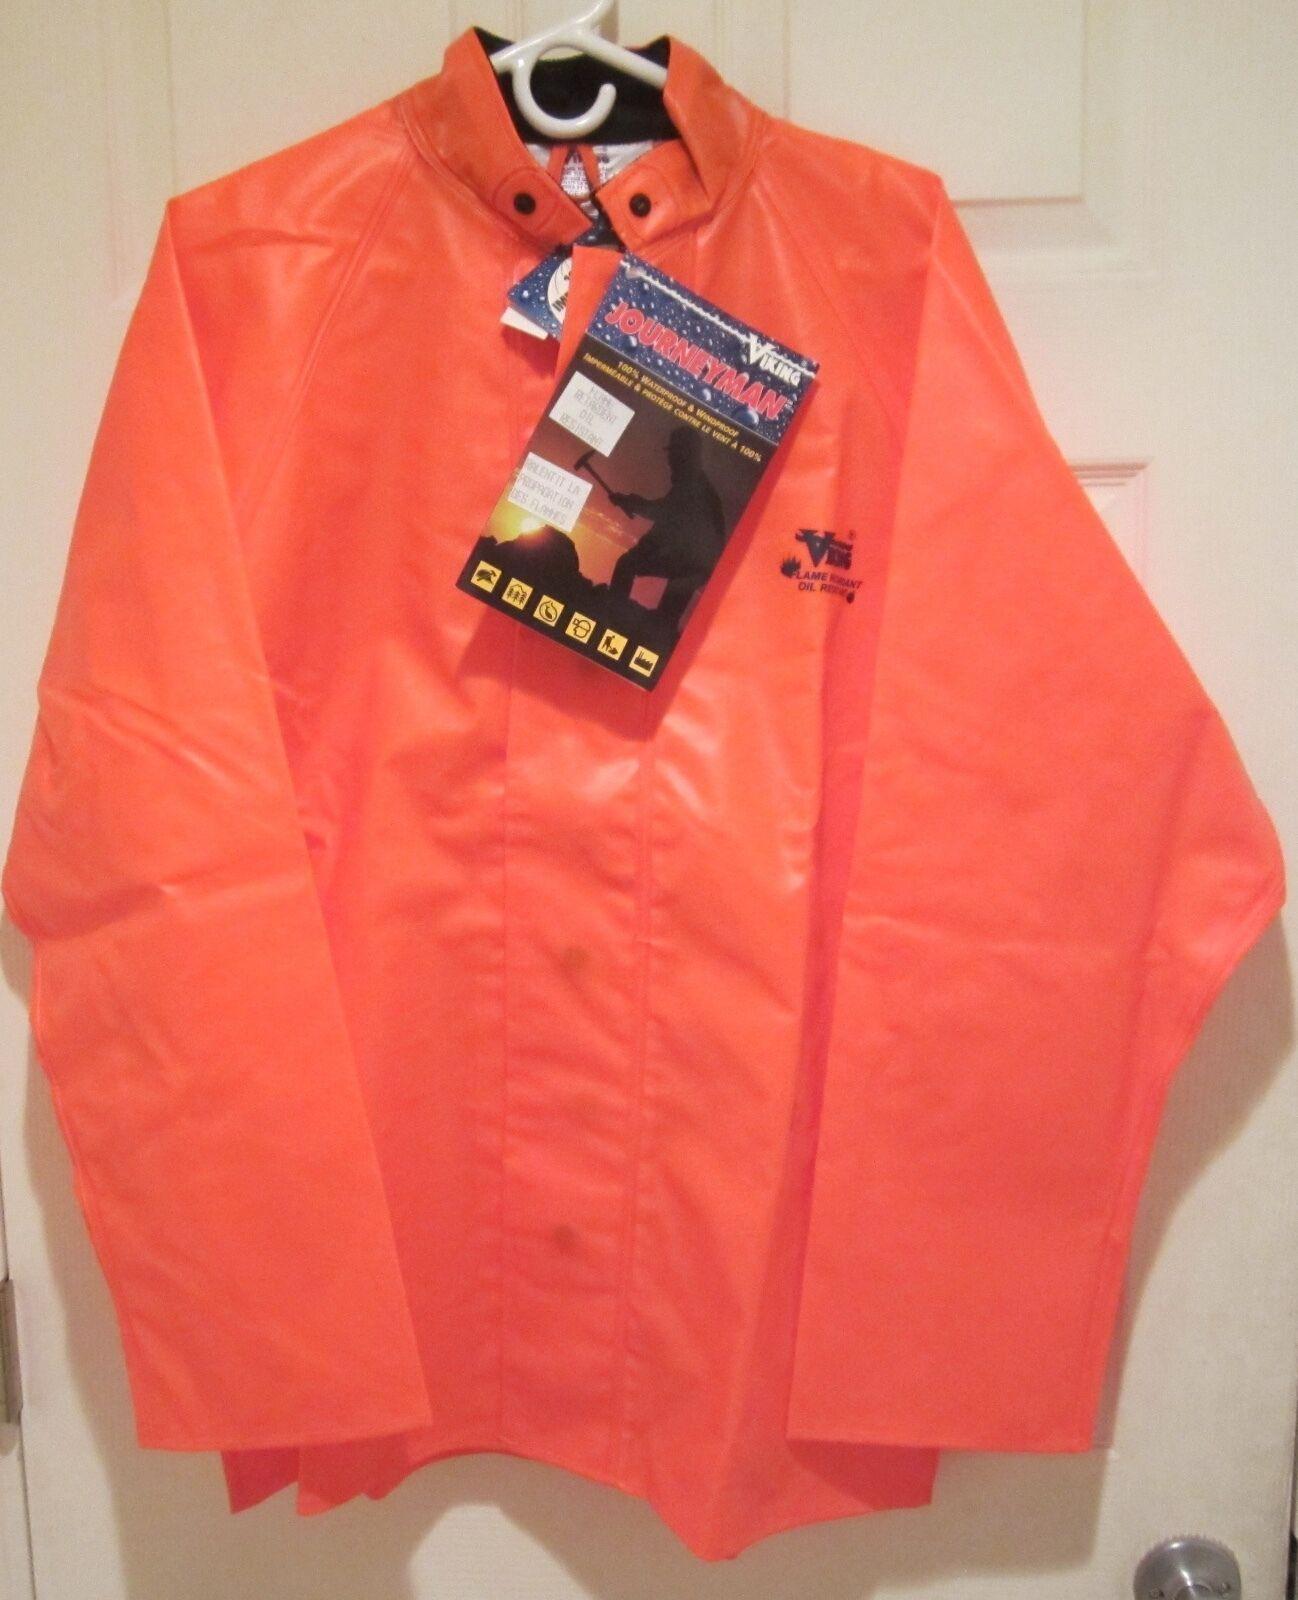 NEW Viking Journeyman Rain Coat Jacket Waterproof Windproof Oil Resistant Large